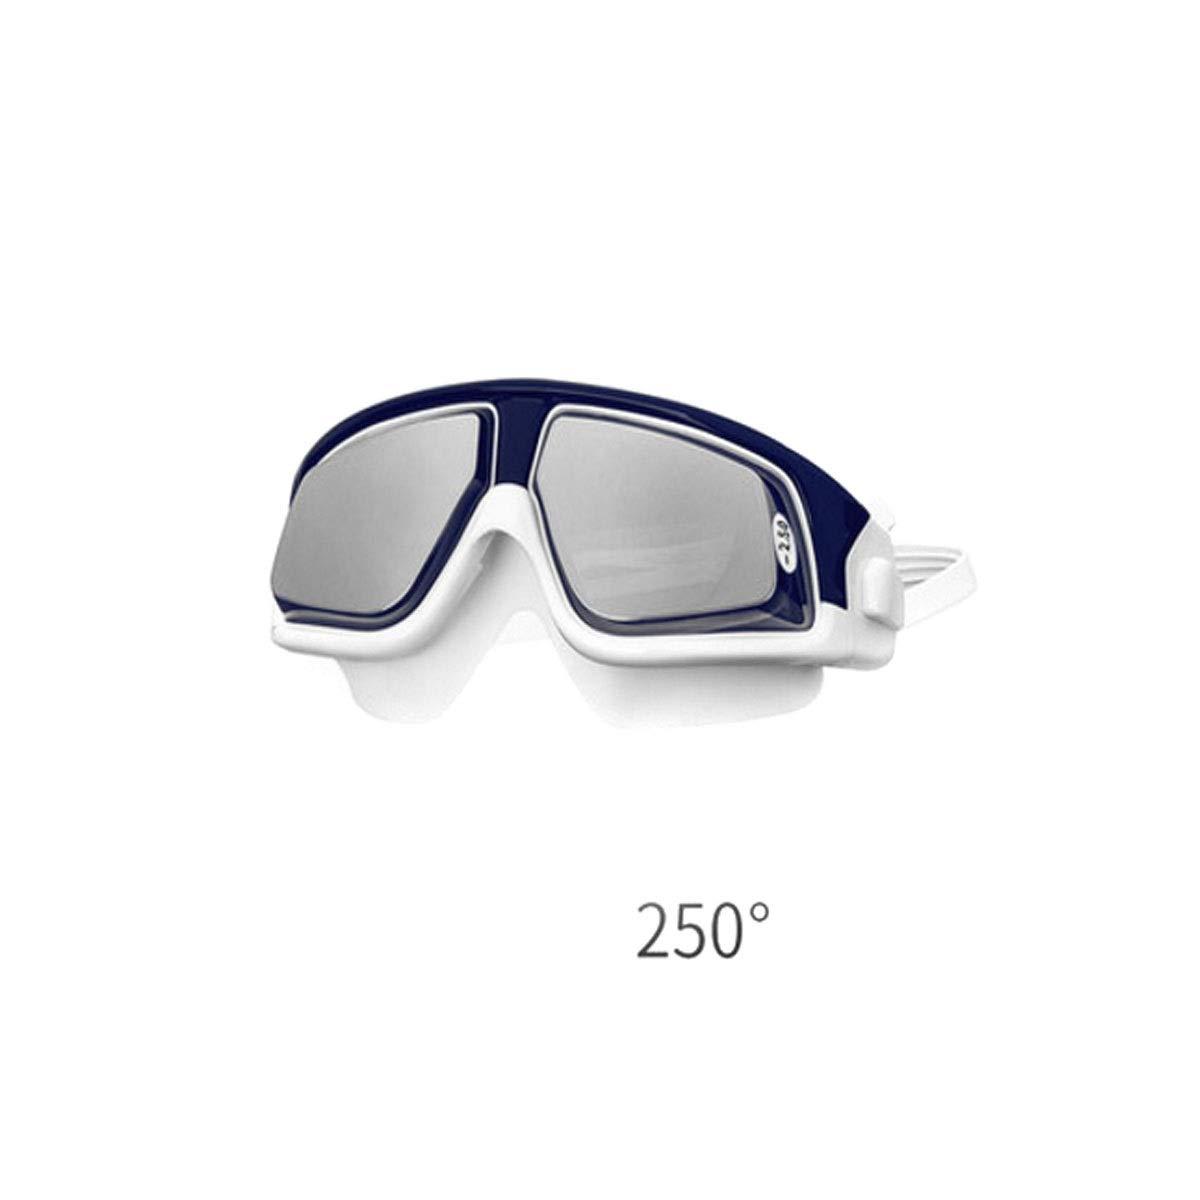 blueee 250° Jiansheng01 Goggles, HD Waterproof UV Predection Large Frame Goggles, Myopia Diving New Equipment Design,blueee 250° Myopia Version Noble